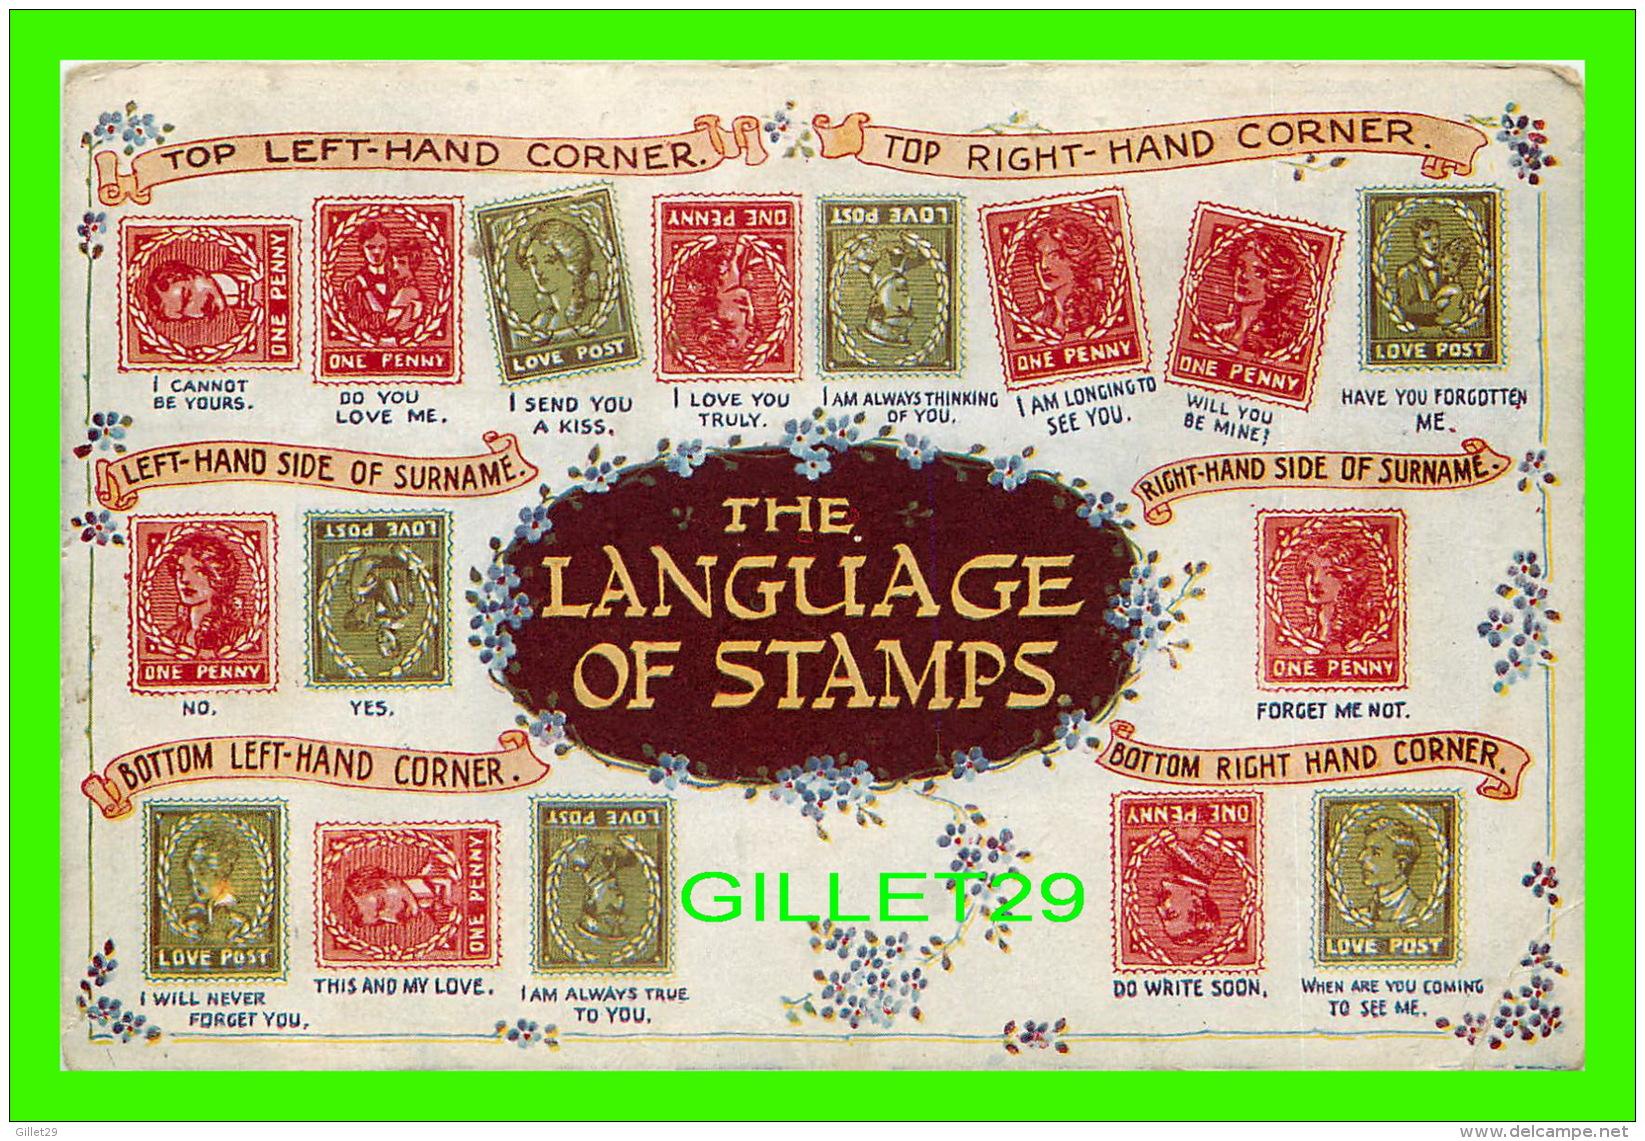 LONDON, UK - THE LANGUAGE OF STAMPS - THE REGENT PUBLISHING CO LTD - - Autres